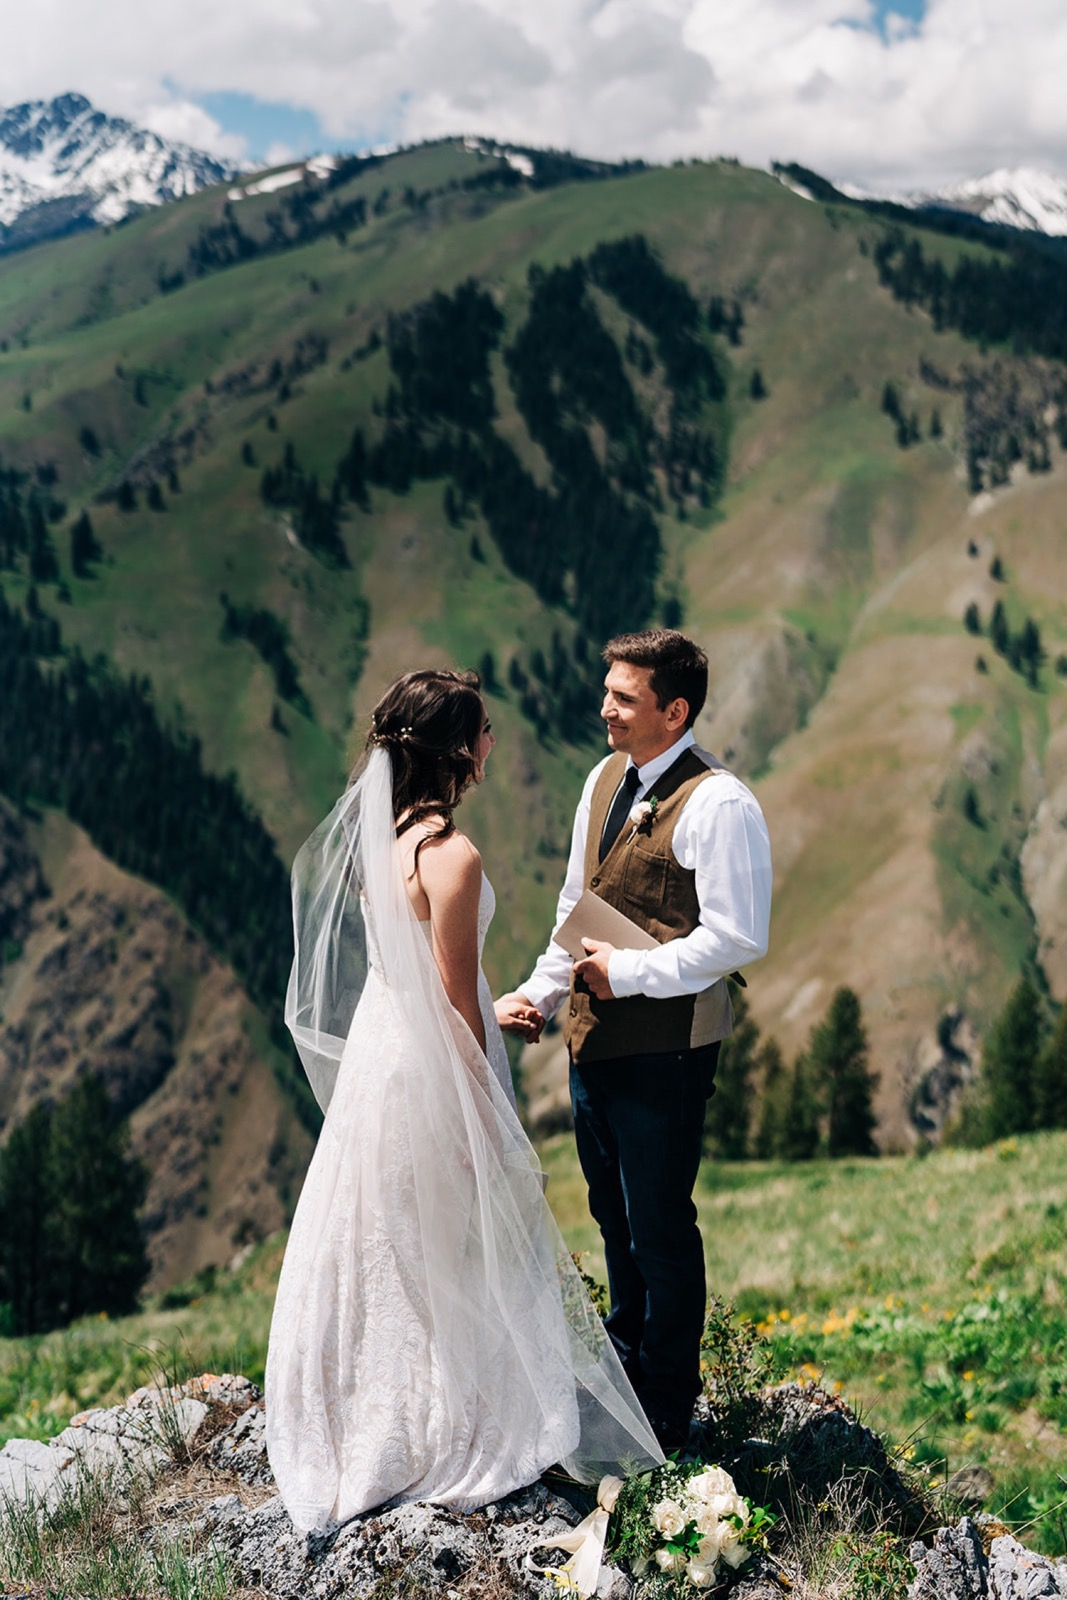 076_katie_chris_wedding-250.jpg